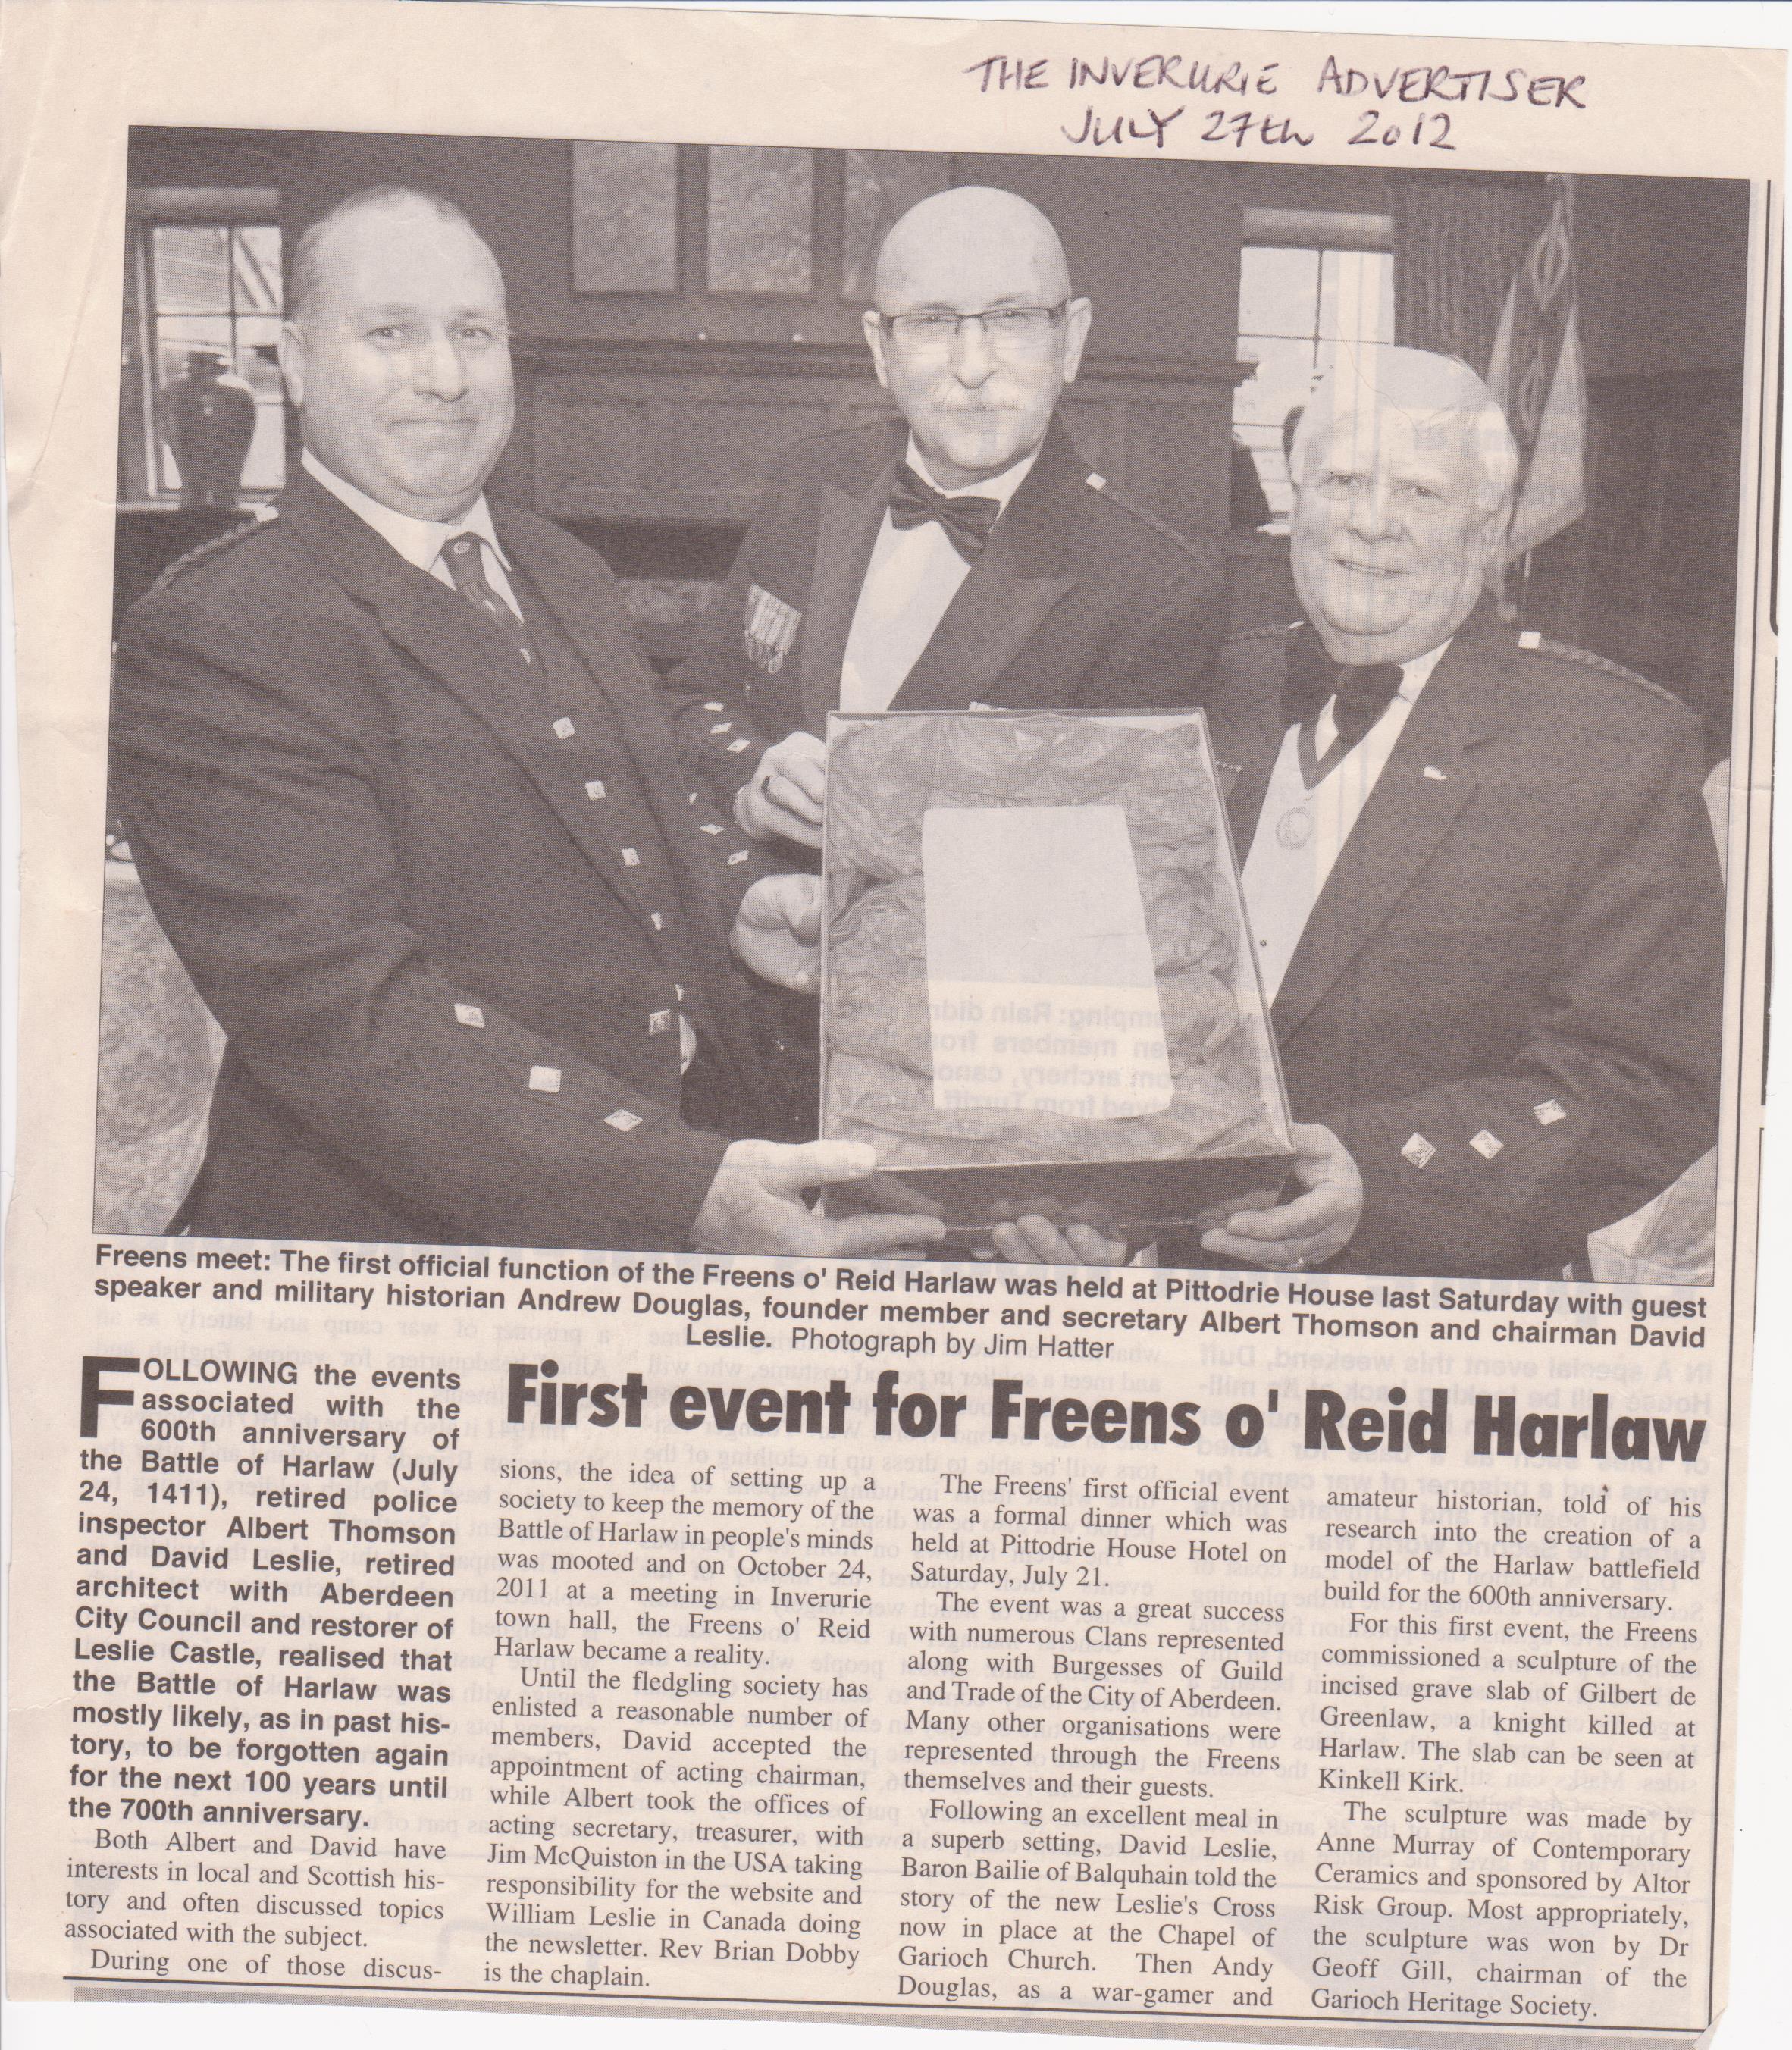 Freens o Reid Harlaw Commission